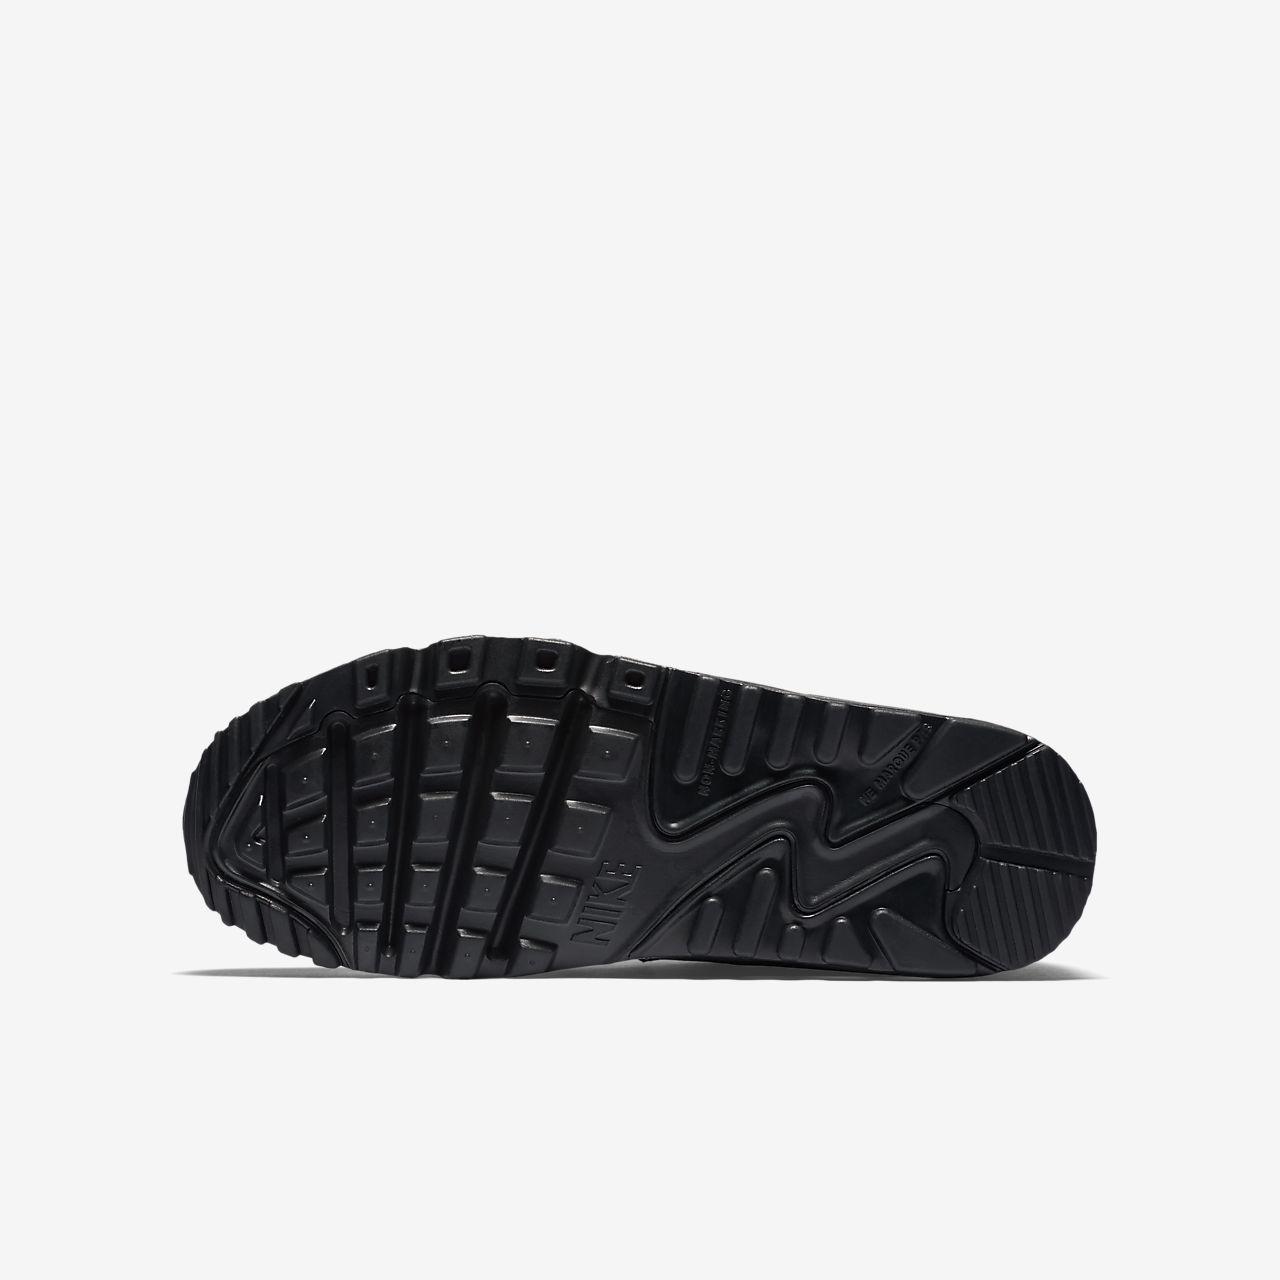 reputable site c1e30 e043d ... Nike Air Max 90 Leather Older Kids  Shoe